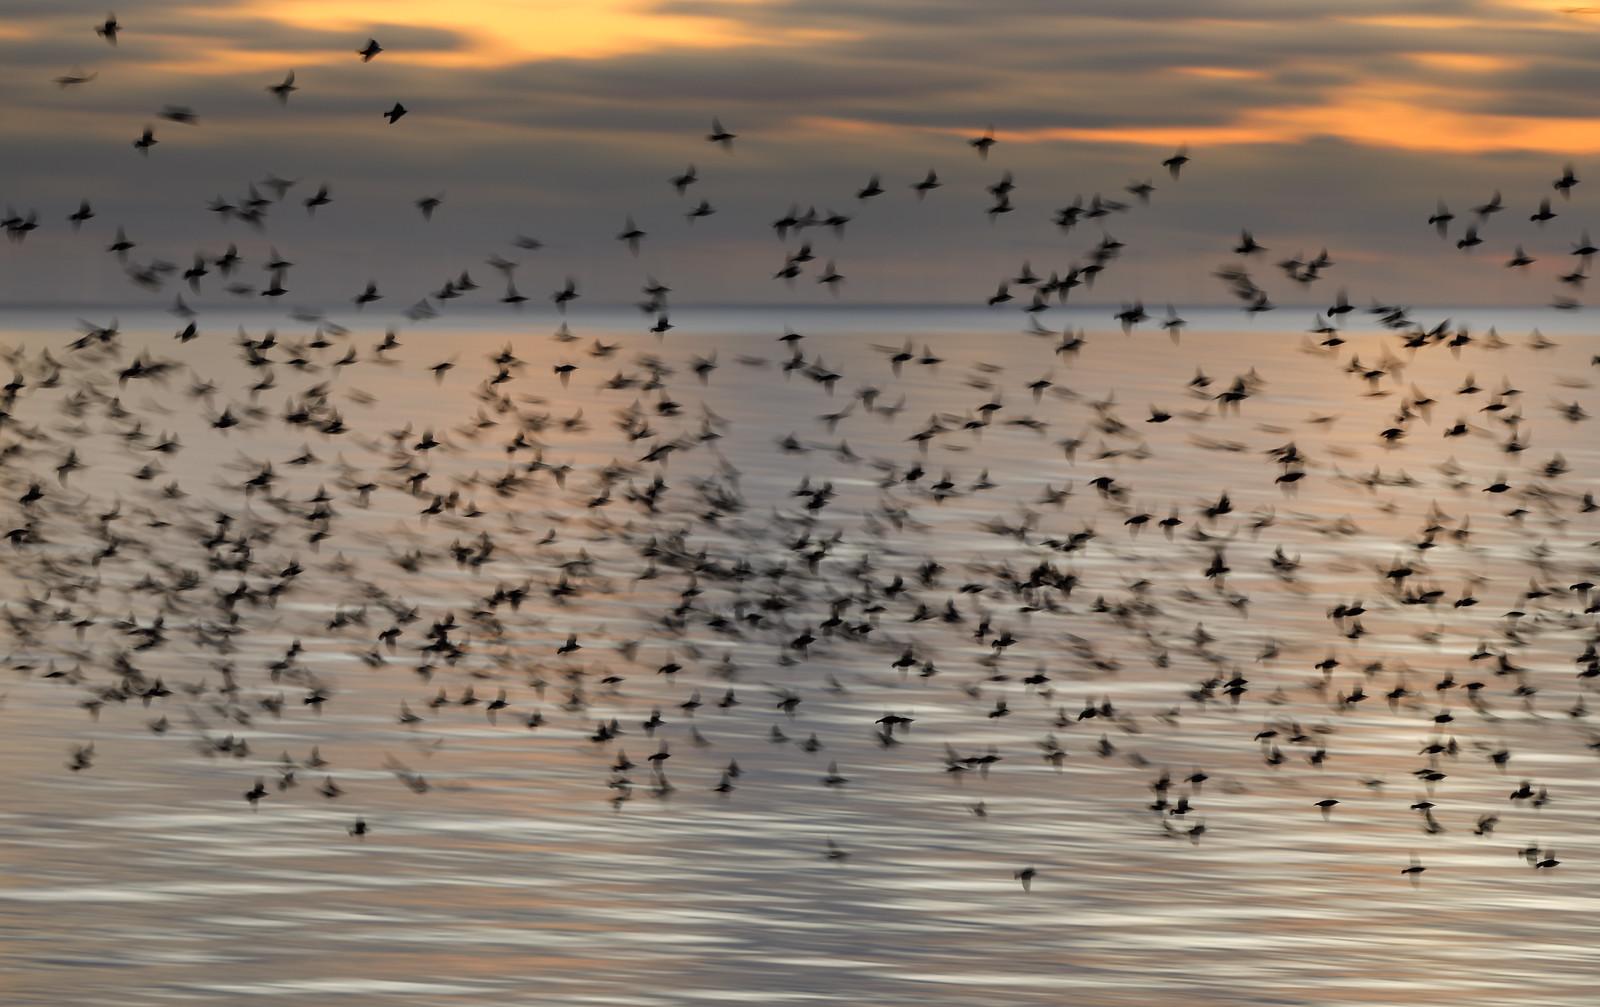 Starling Blurmuration over Silver Sea